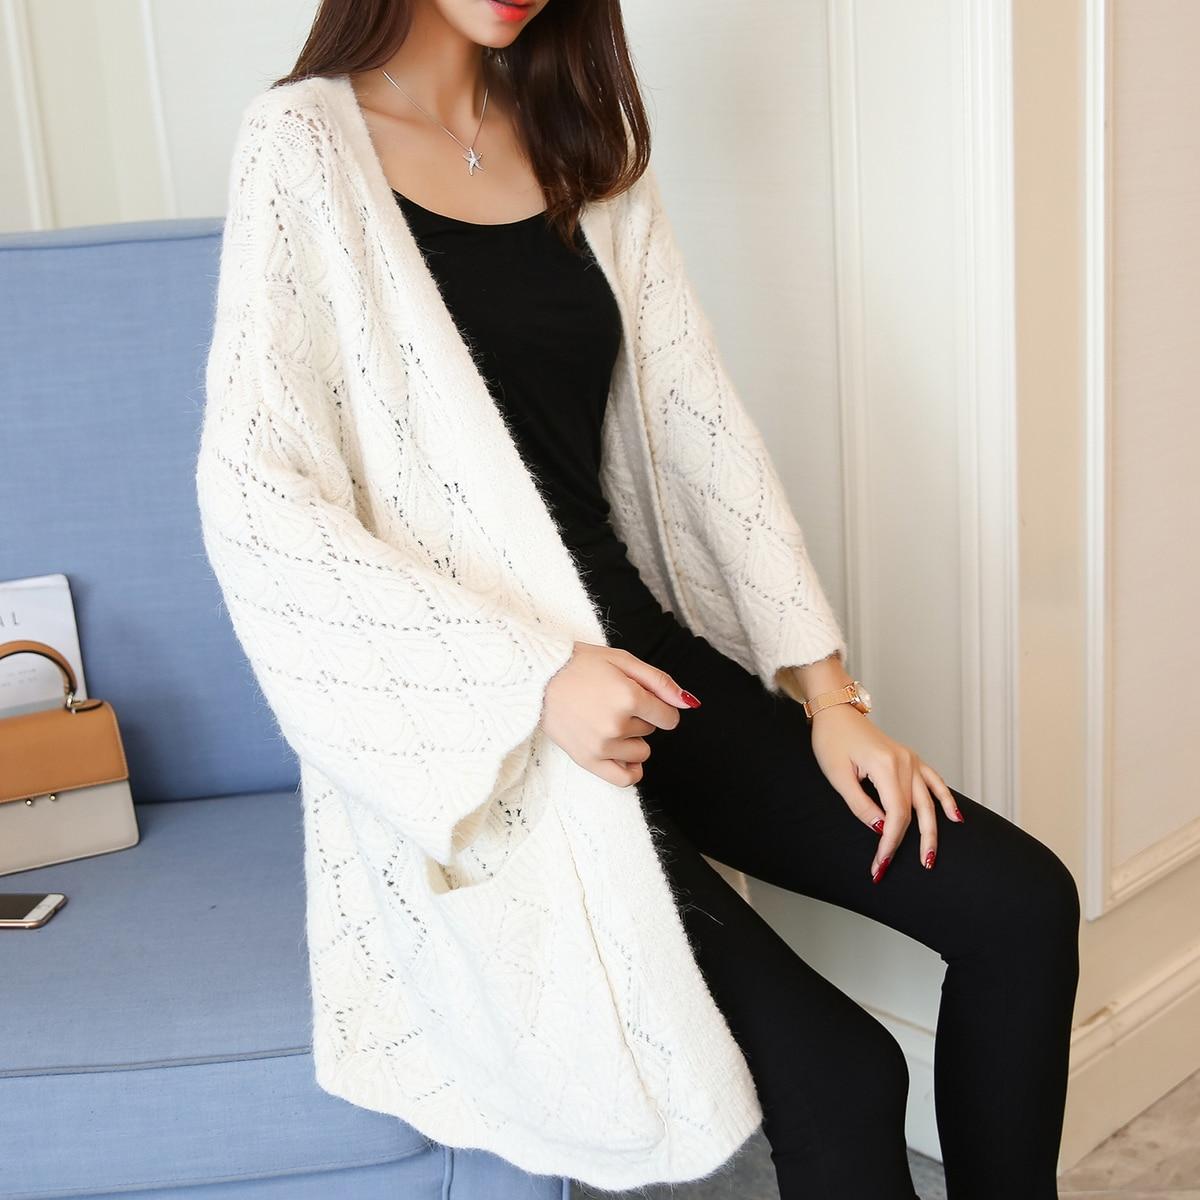 Femmes femmes Cardigan Hiver De see Yuancardigan 5288 New Chart See Manteau Coréenne Chandail Chart Fashionsweater 65 W1caBBf